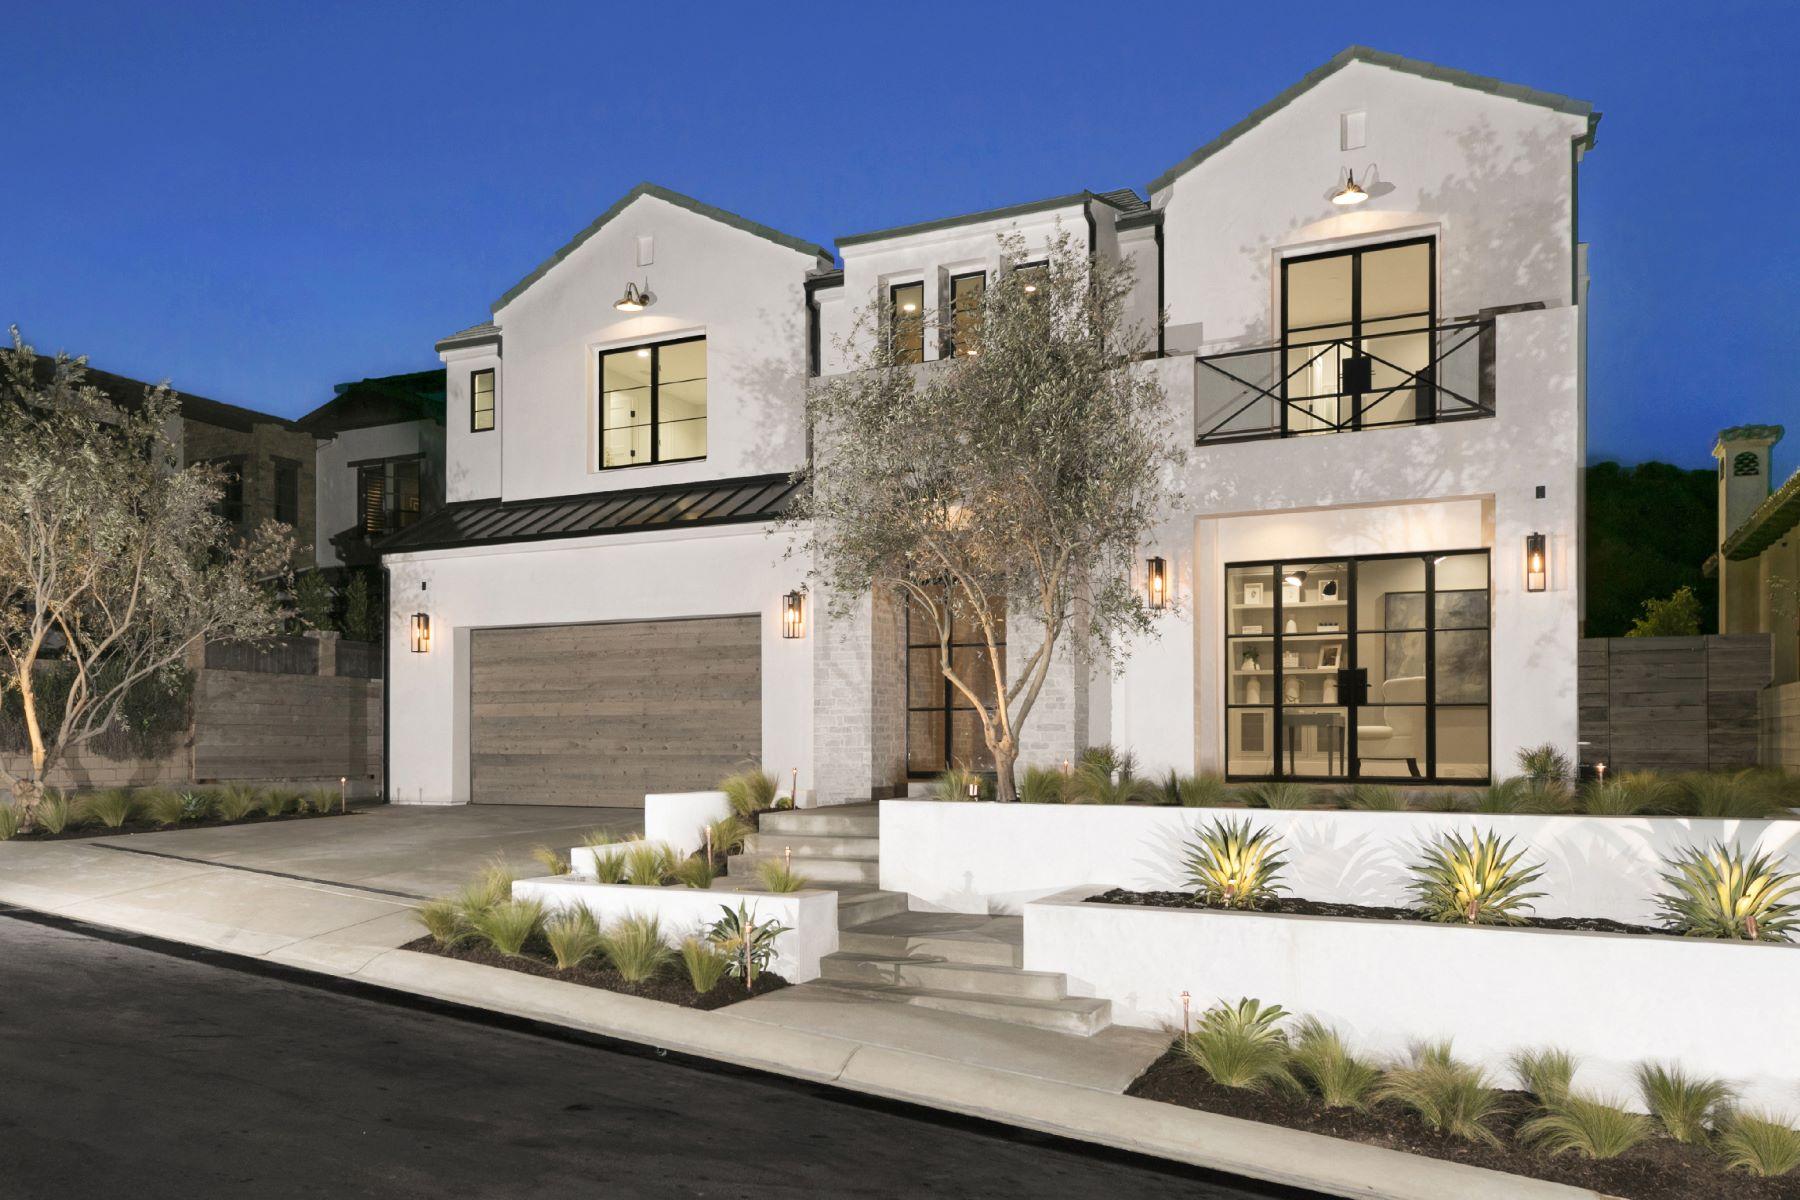 Single Family Homes for Active at 620 Seaward Corona Del Mar, California 92625 United States